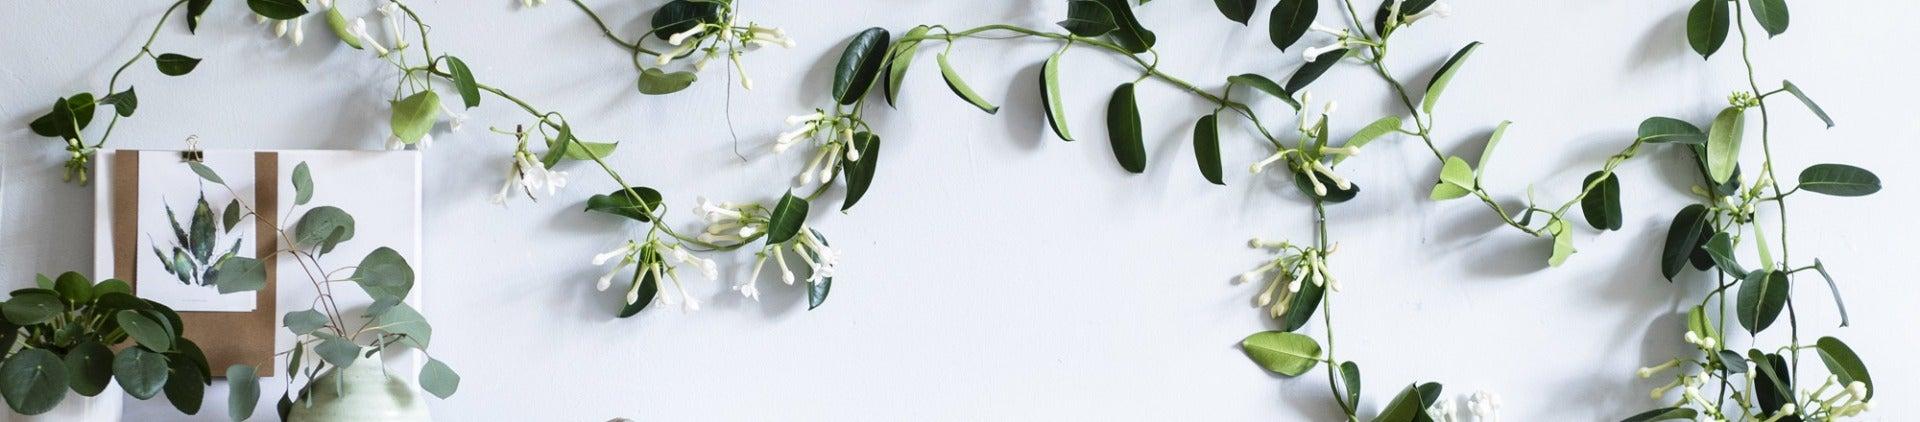 Kamerplantencursus: snoeien en groeien